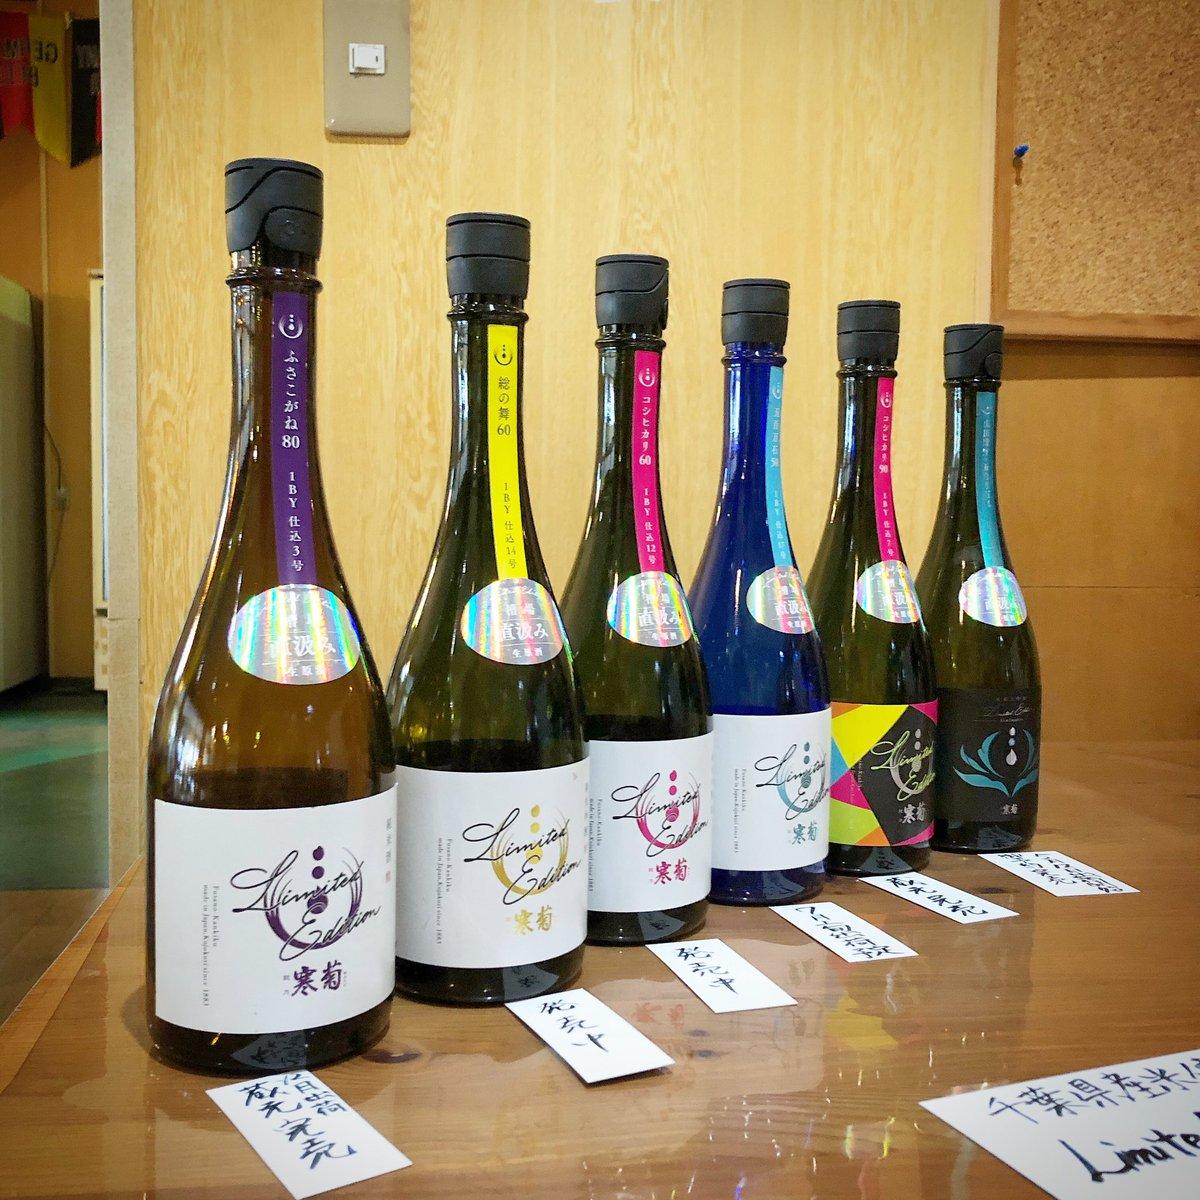 "test ツイッターメディア - 本日は千葉県山武市の寒菊銘醸を訪問しました。寒菊銘醸は清酒""総乃寒菊""の他に、麦酒""九十九里オーシャンビール""を醸造していることで有名です。3年前から日本酒造りの大改革を開始し、ラベルや火入れの方法、分析器等を導入し、九十九里の風土にあったフレッシュで爽やかな味わいを演出しています。 https://t.co/tOj5wA2I4n"